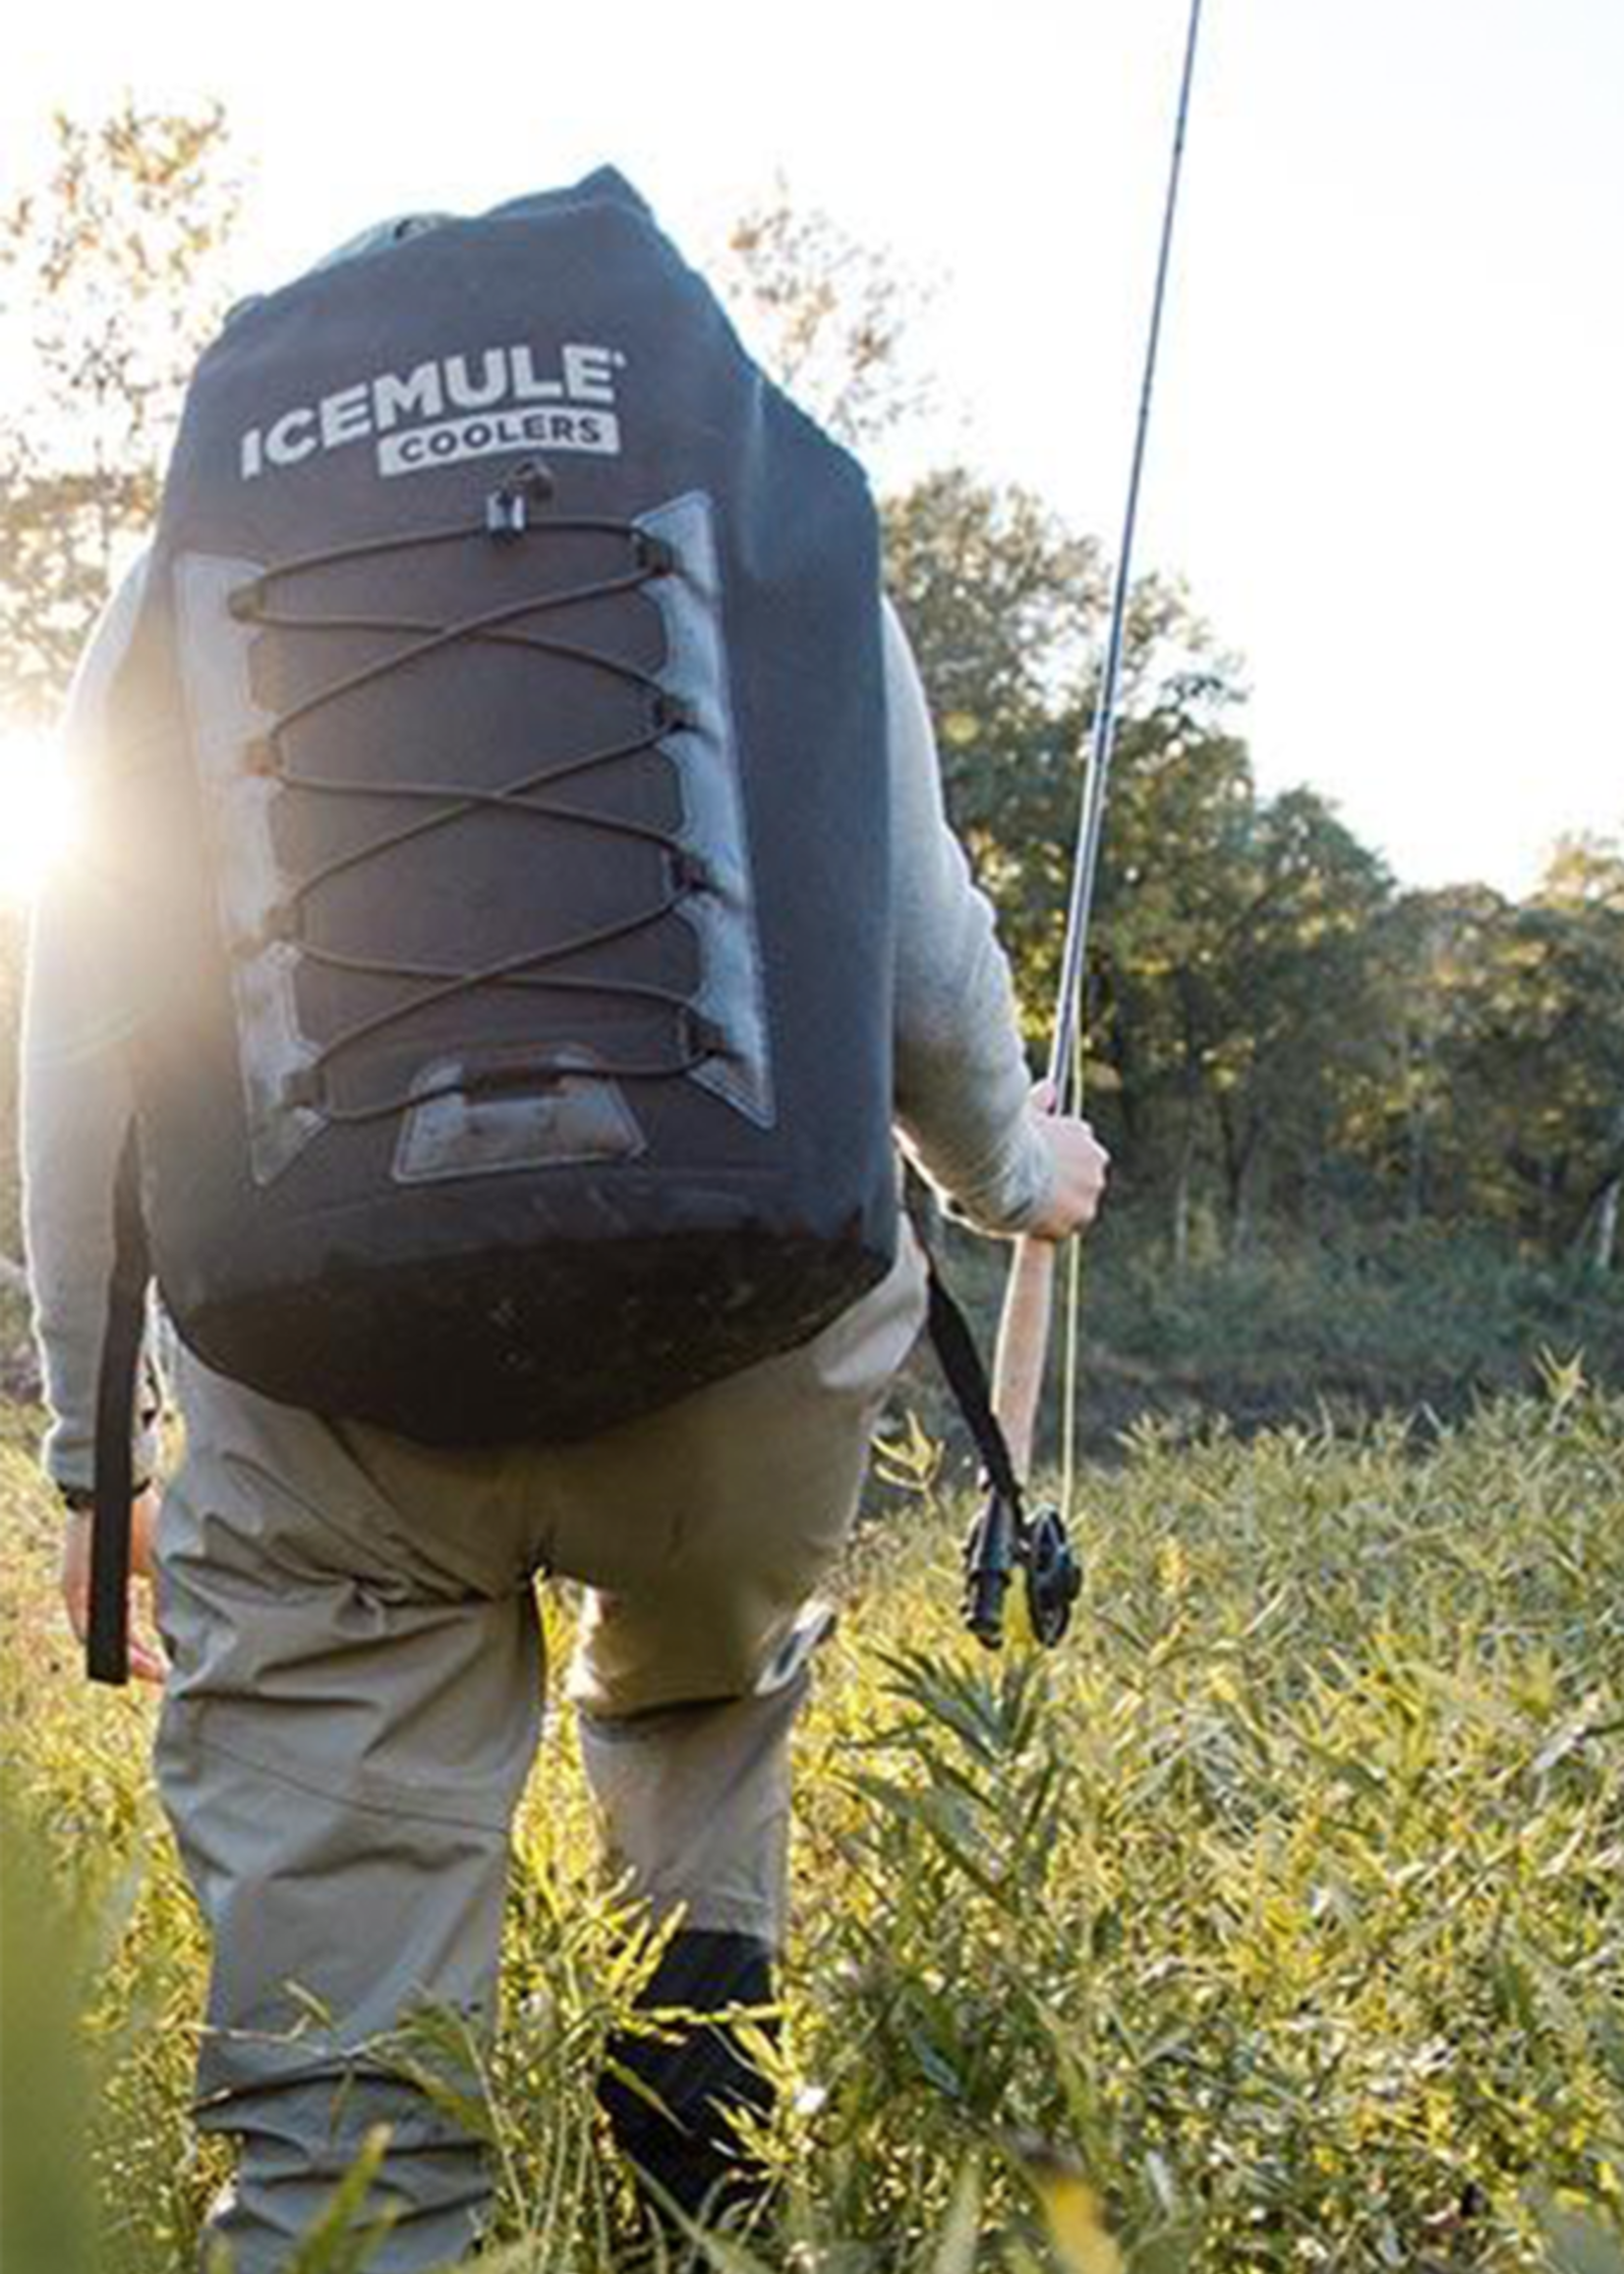 IceMule IceMule Pro Cooler - XL